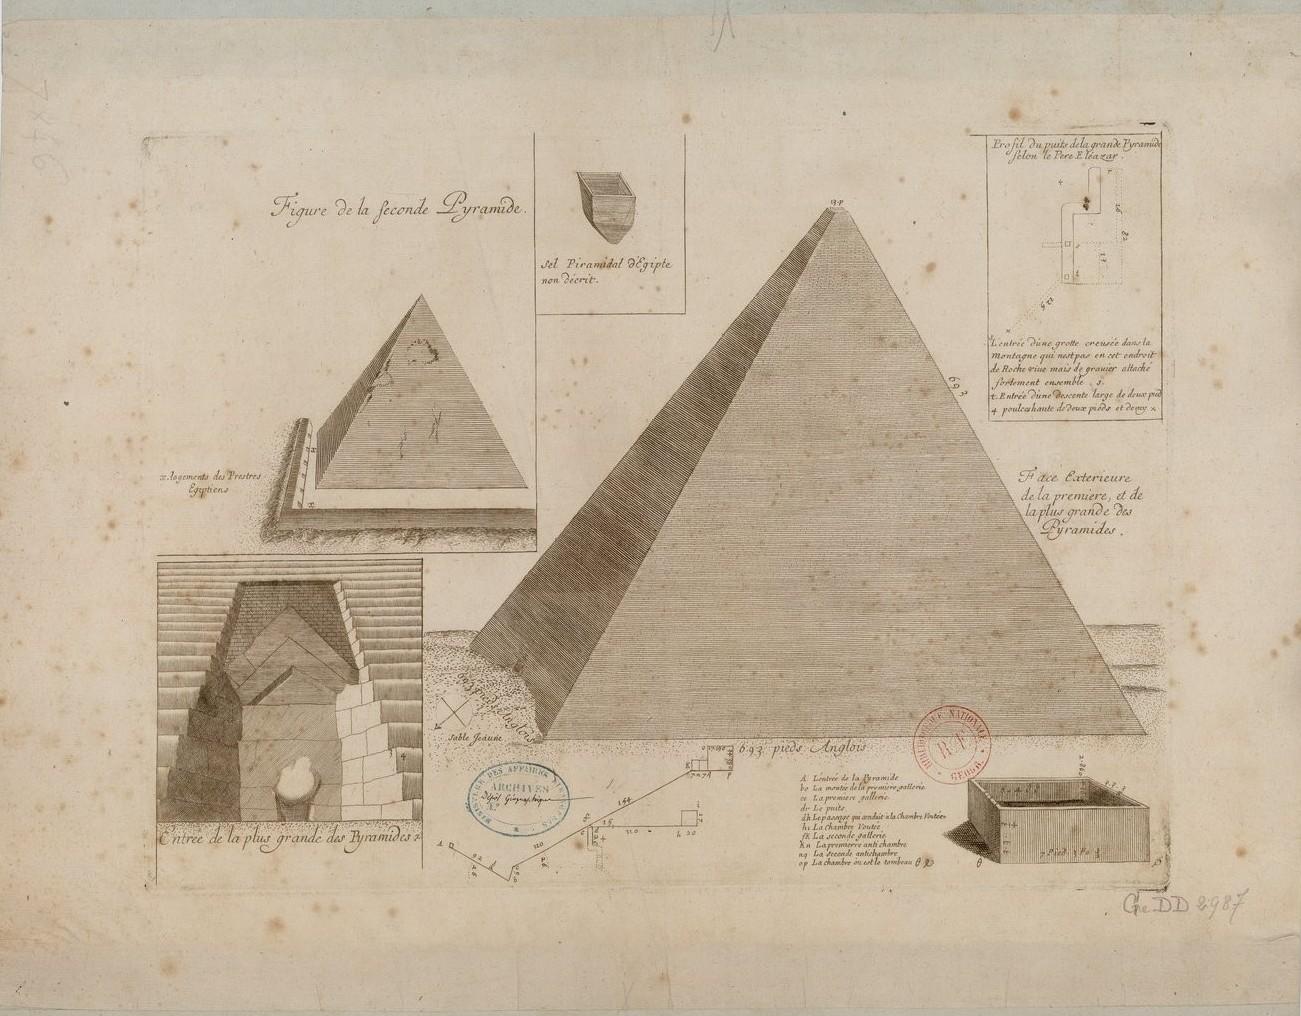 Описание пирамид Египта